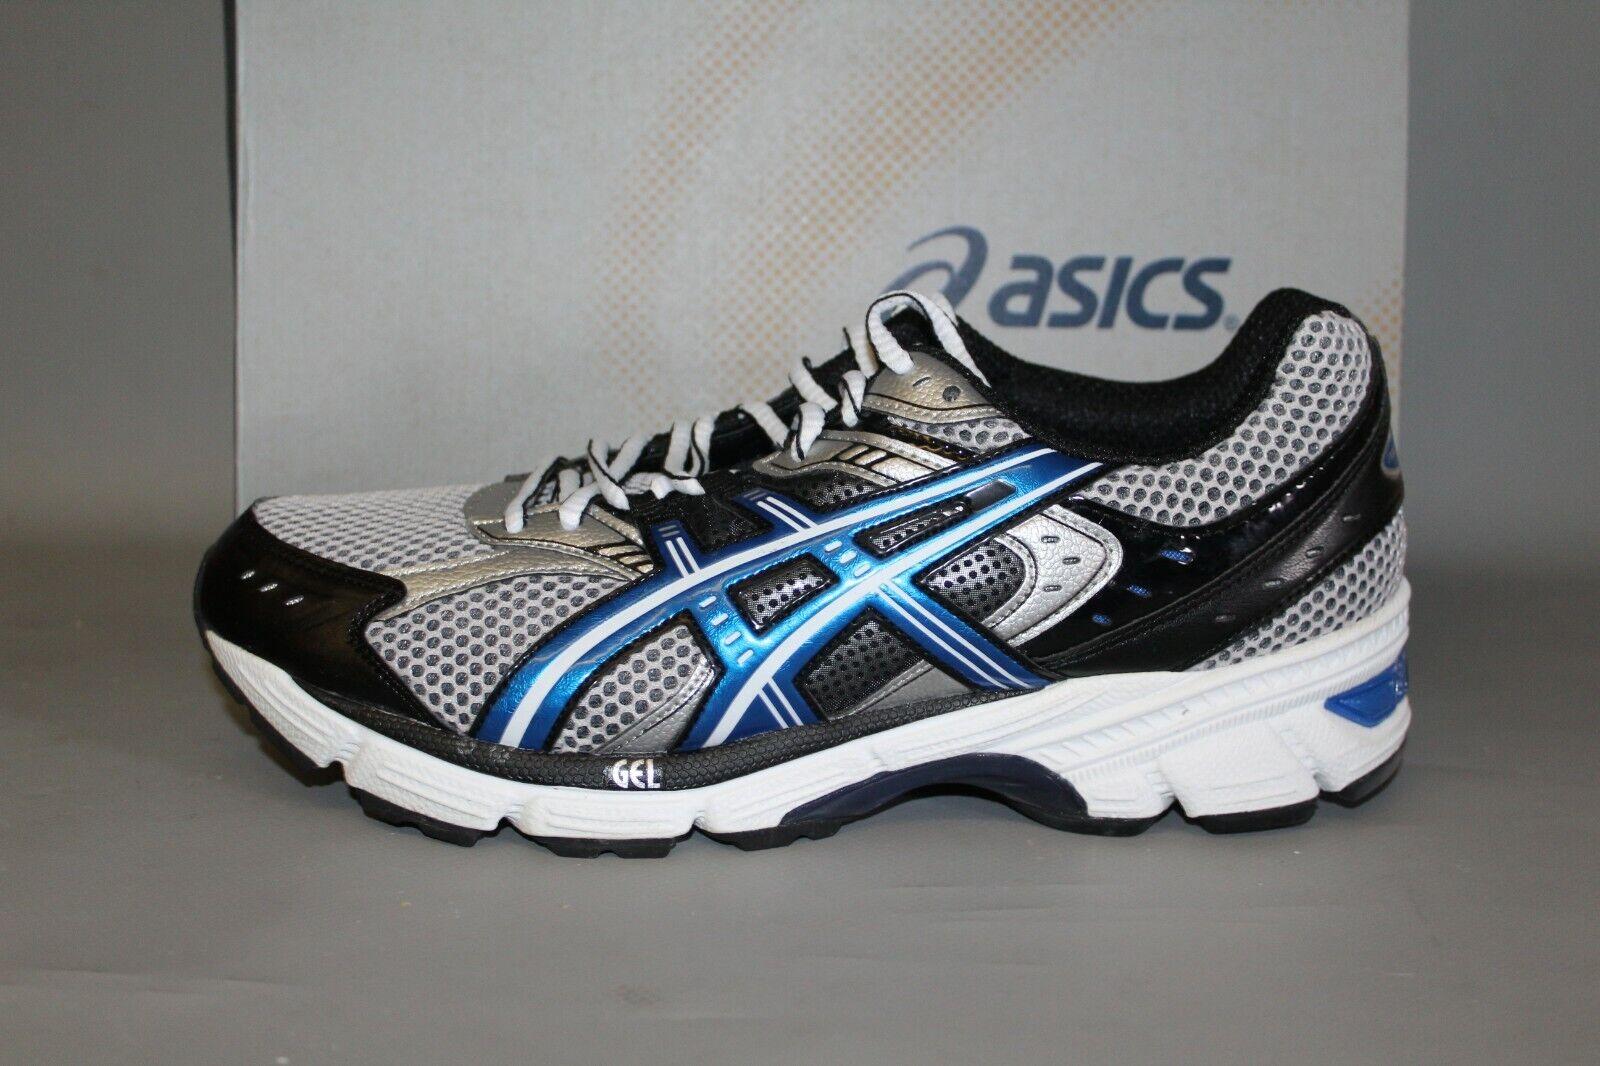 NEW Men's Asics Gel Equation 5 Size 12.5 D (Medium) Athletic   Running shoes